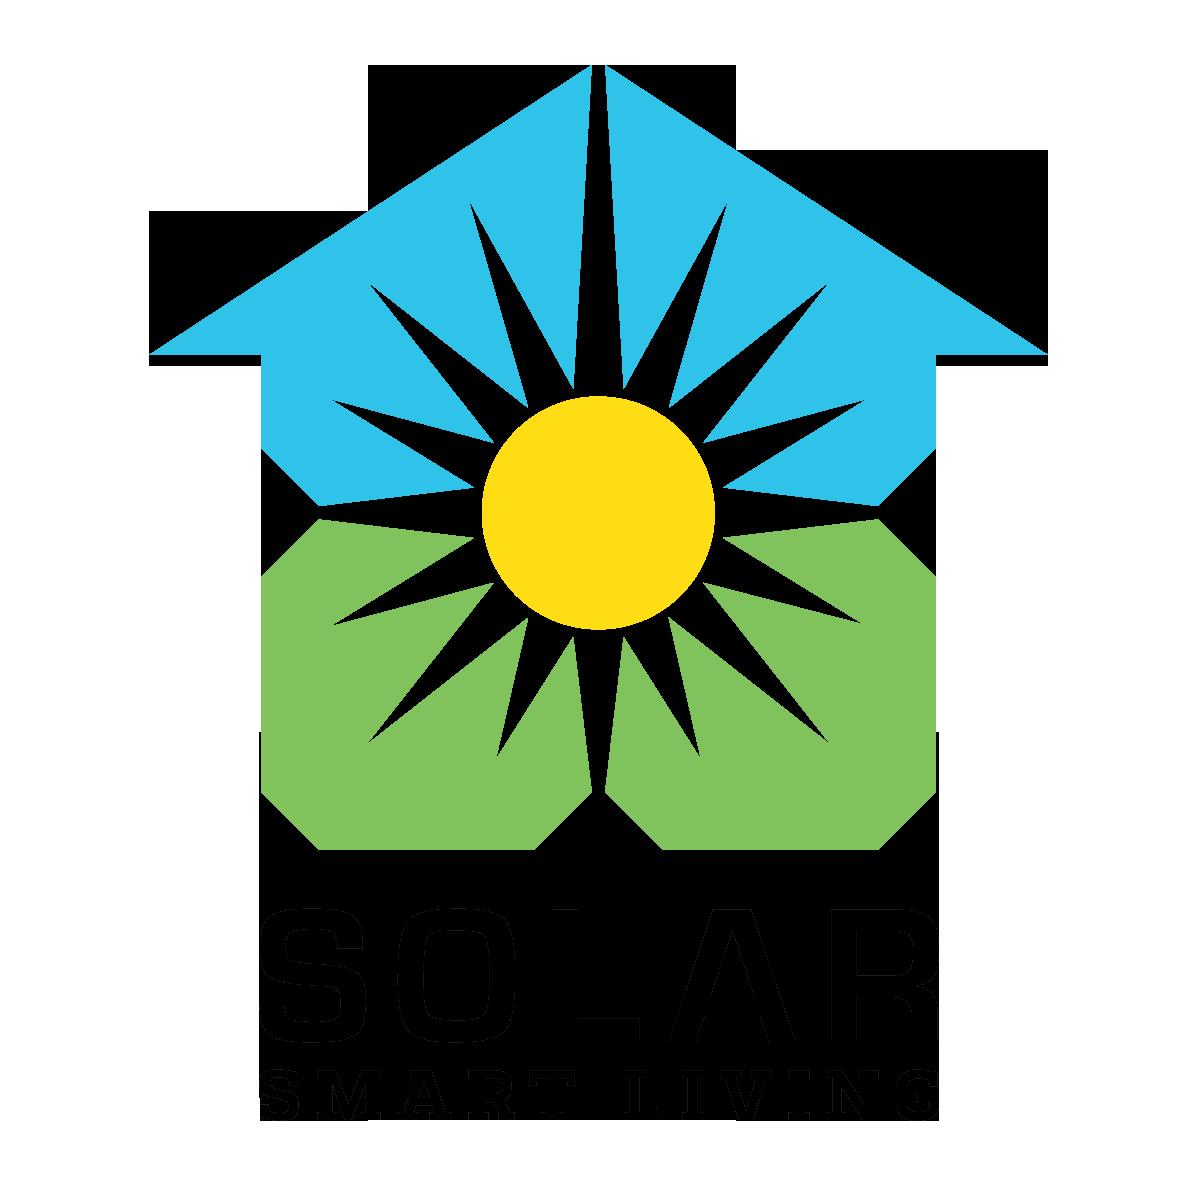 Vivint solar reviews california - 4 92 Based On 13 Reviews